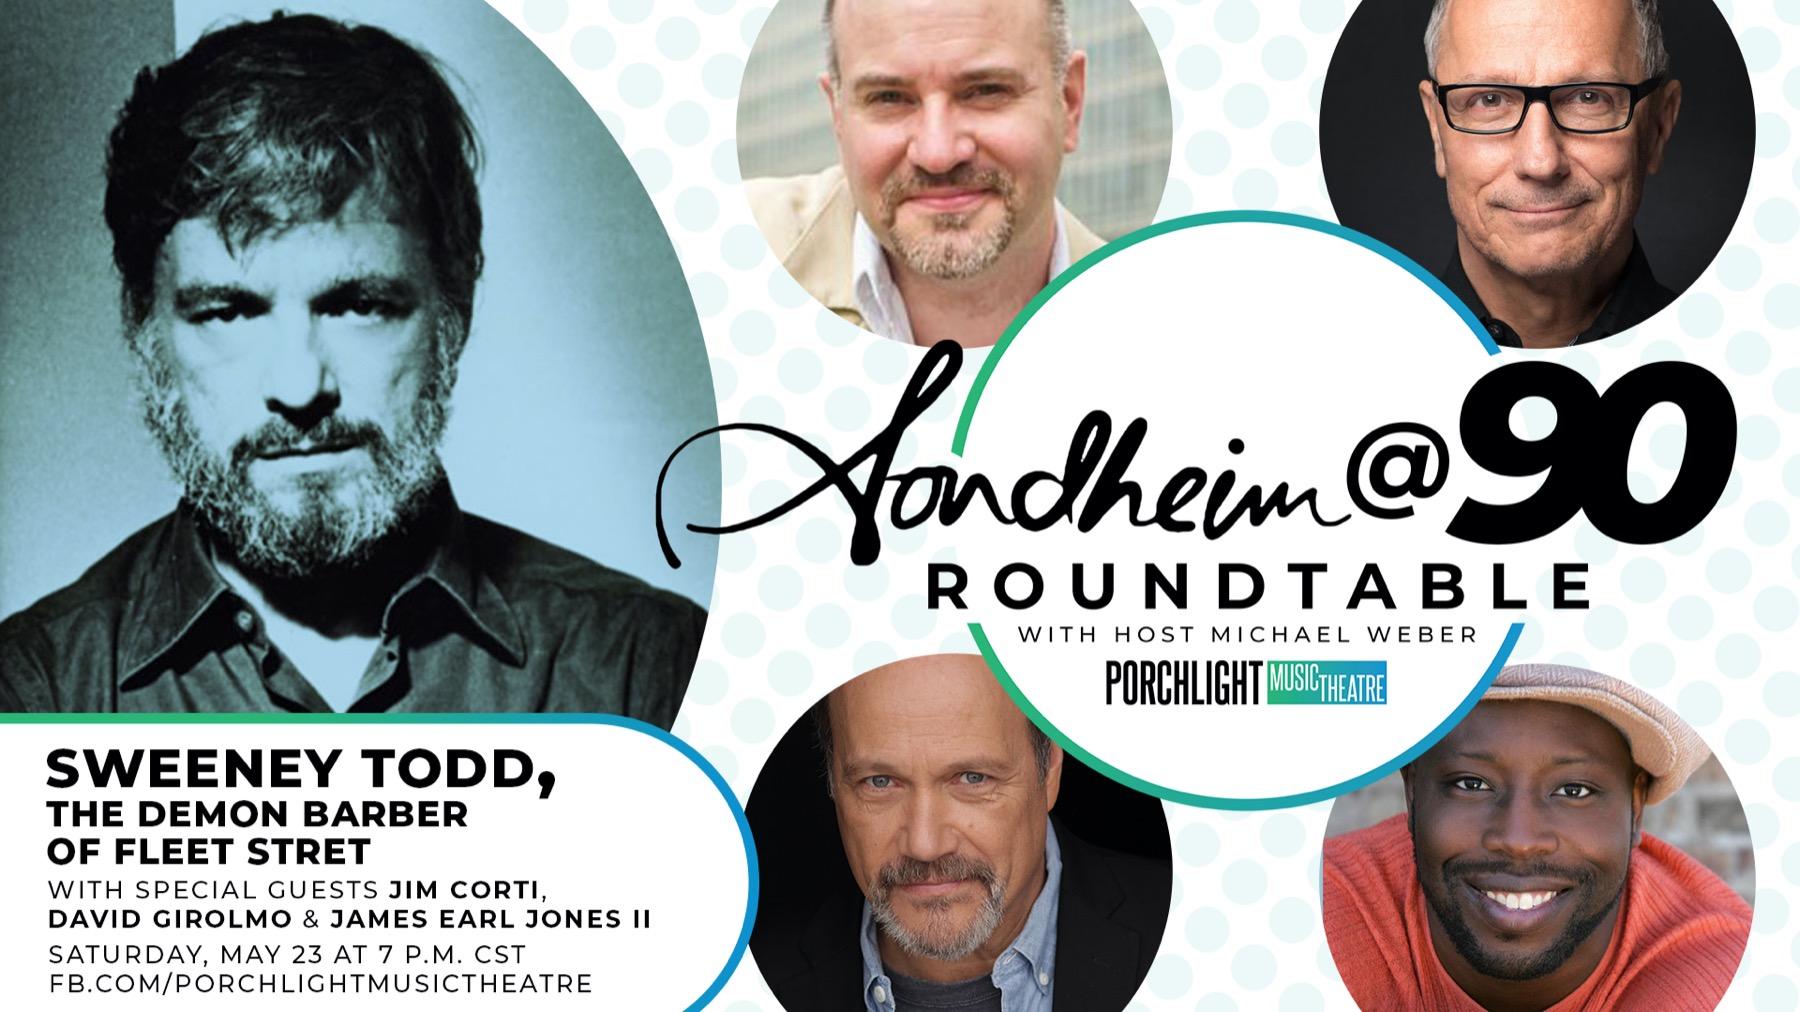 Sondheim @ 90 Roundtable: Sweeney Todd